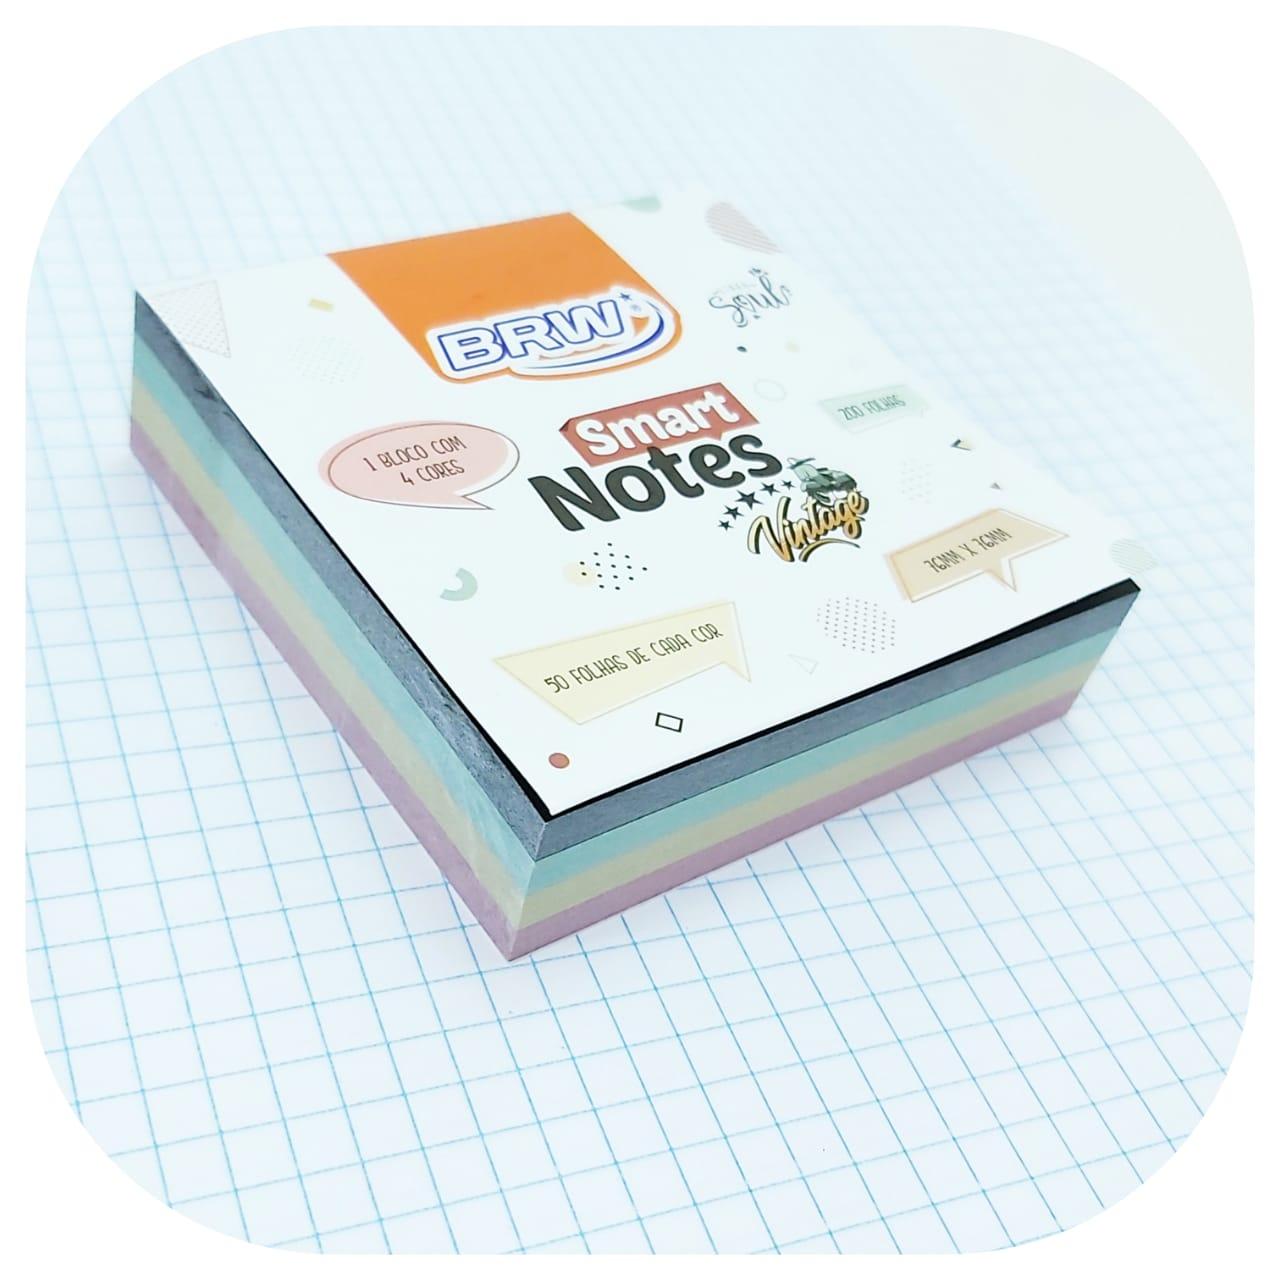 Bloco Smart Notes Vintage - Quadrado - 76x76mm - 200 folhas -BRW